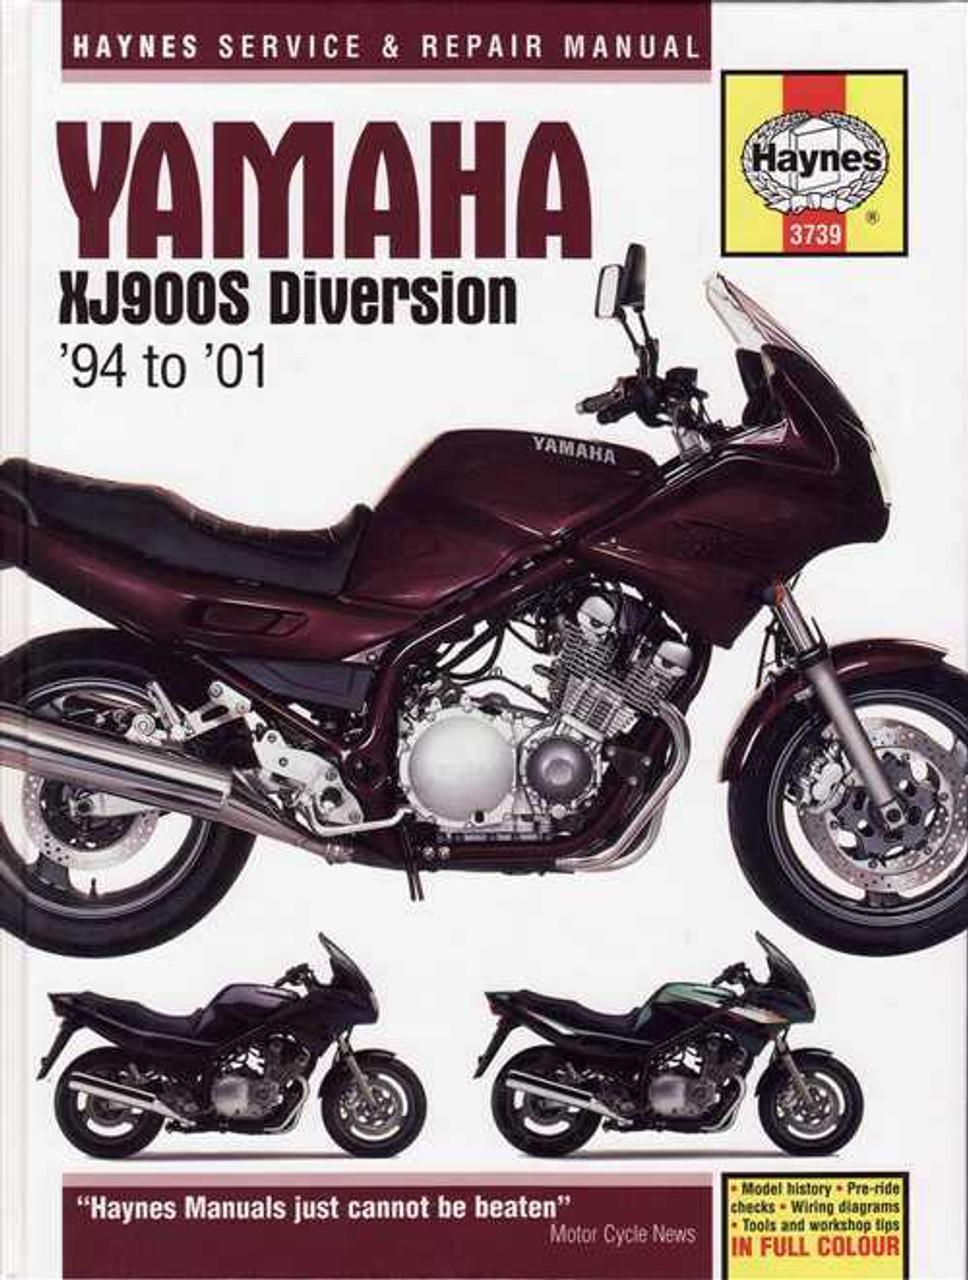 yamaha xj900s diversion 1994 2001 workshop manual rh automotobookshop com au yamaha xjr 1200 owners manual download yamaha xjr 1200 service manual download